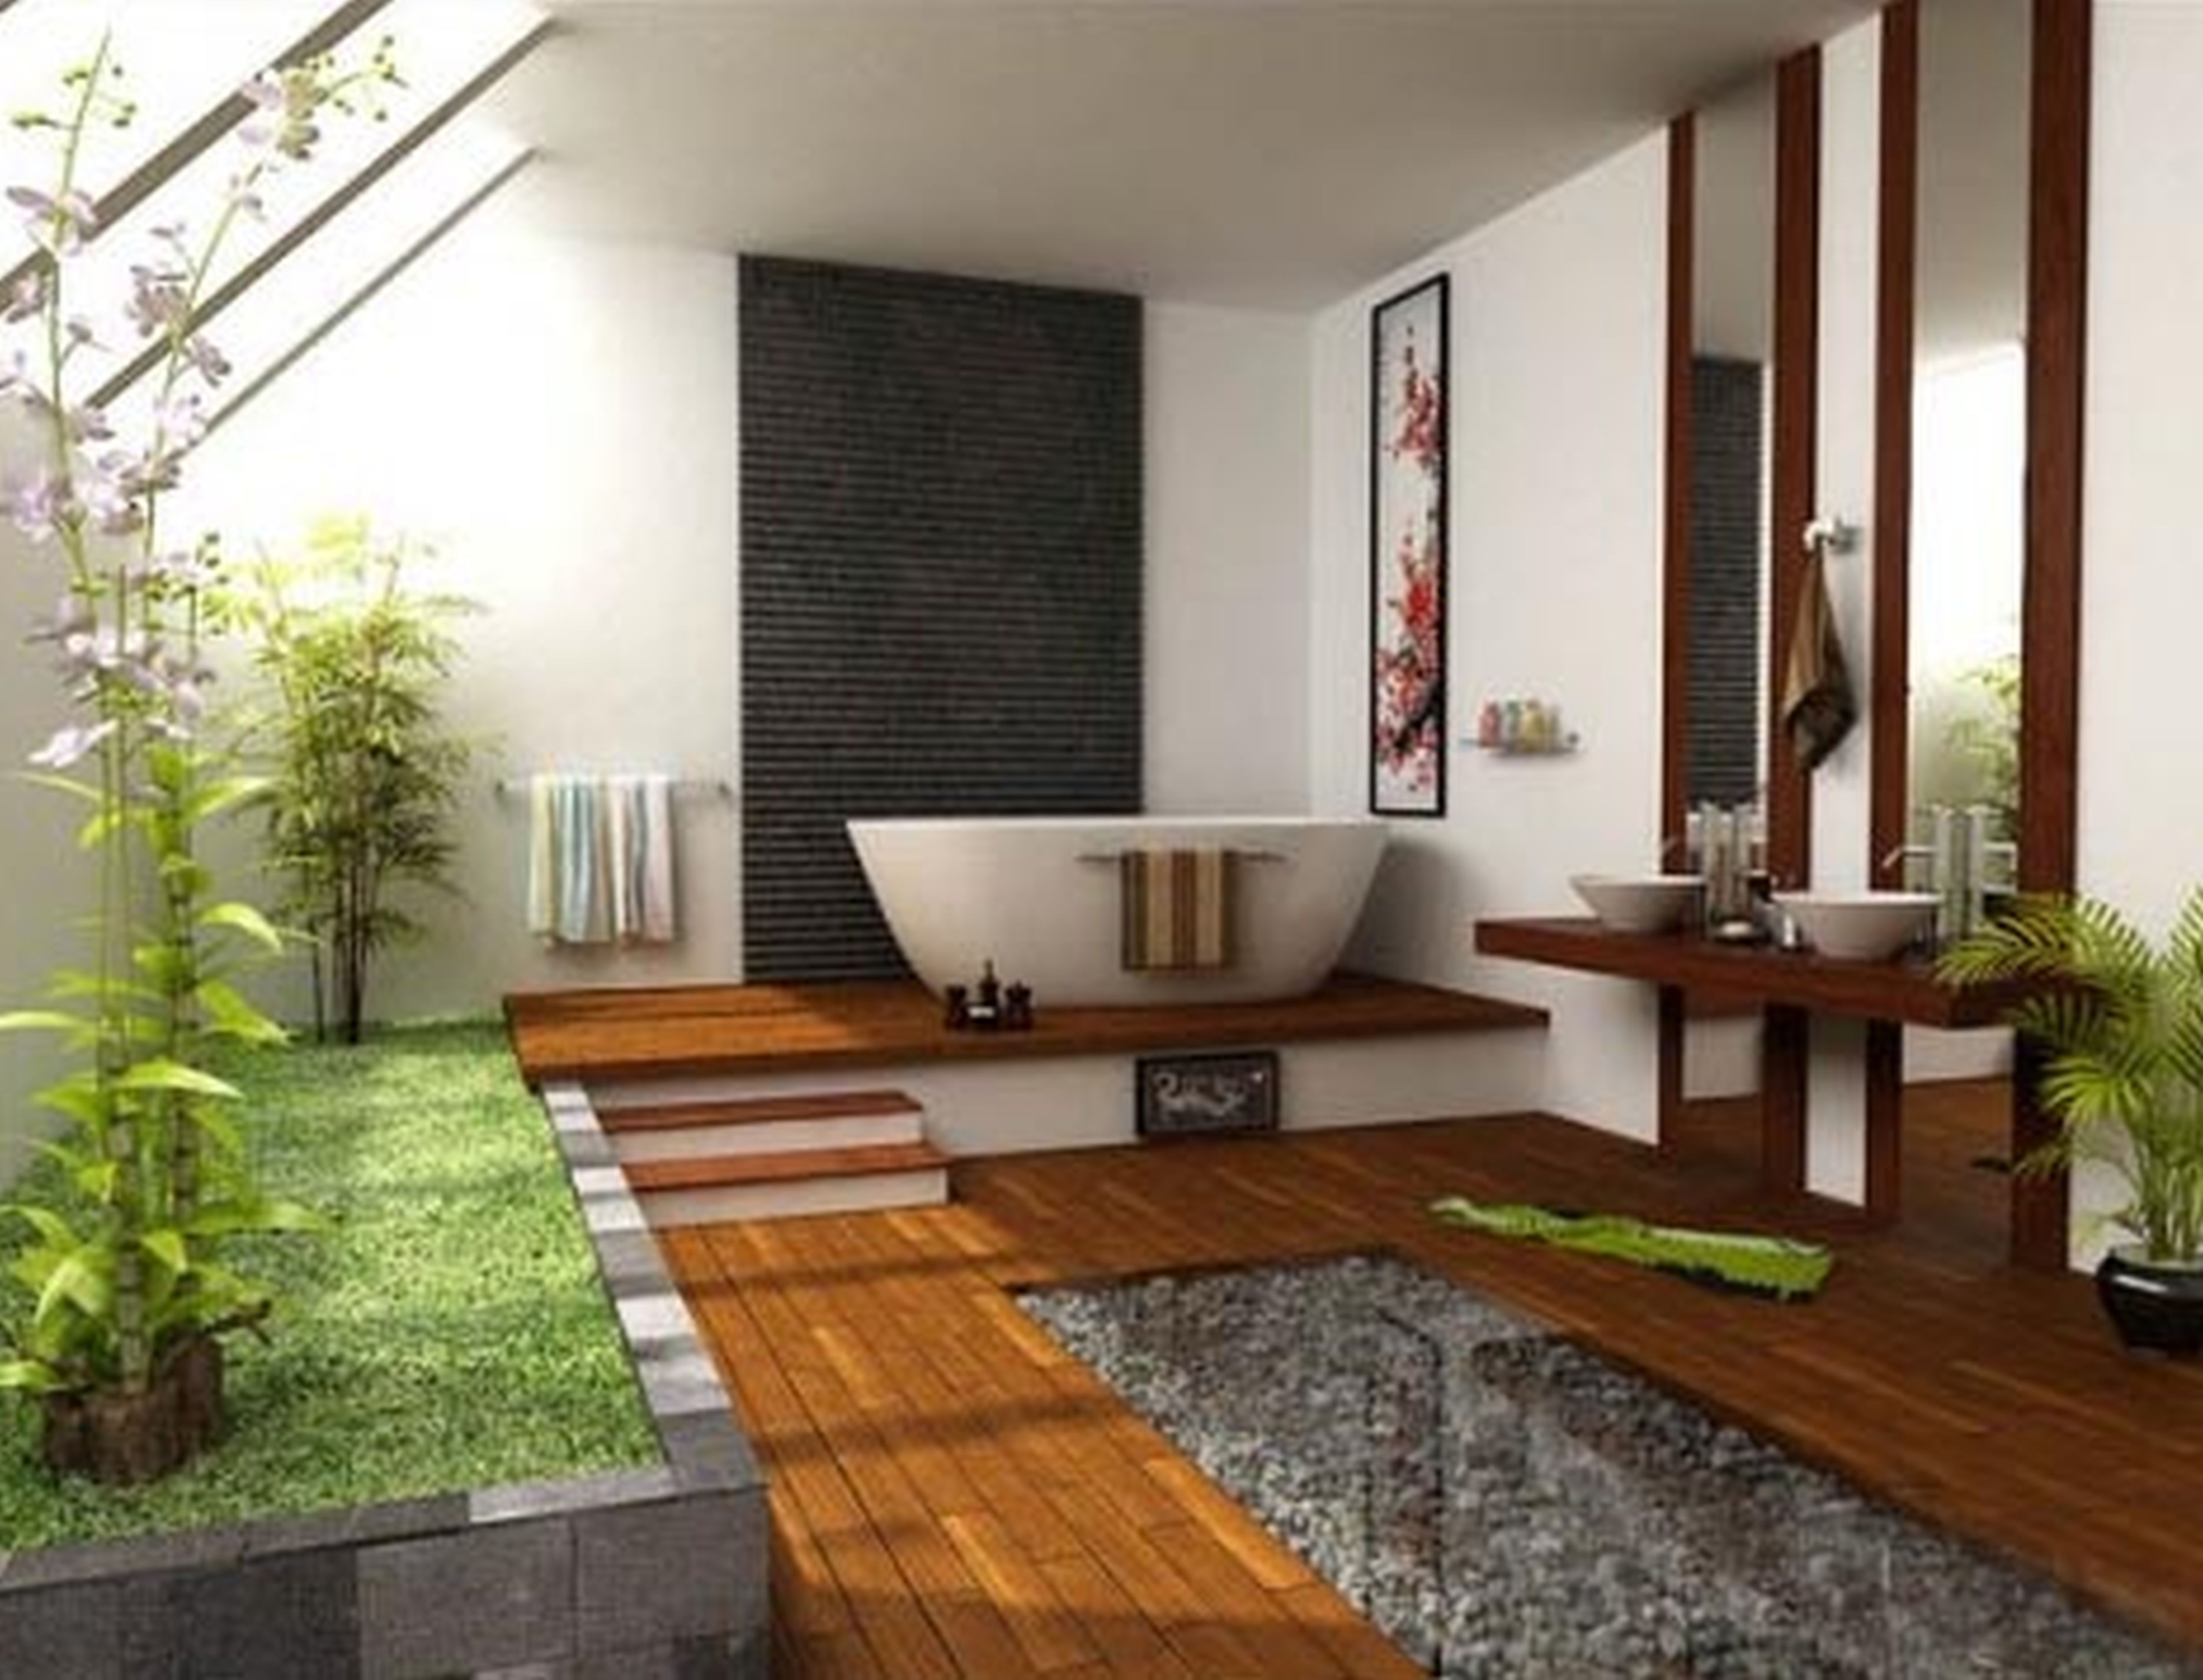 Architectural Home Designs Apartment Modern Bathroom Interior Design Pictures Scenic Nice Decor Japanese Bathroom Design Zen Bathroom Design Outdoor Bathrooms